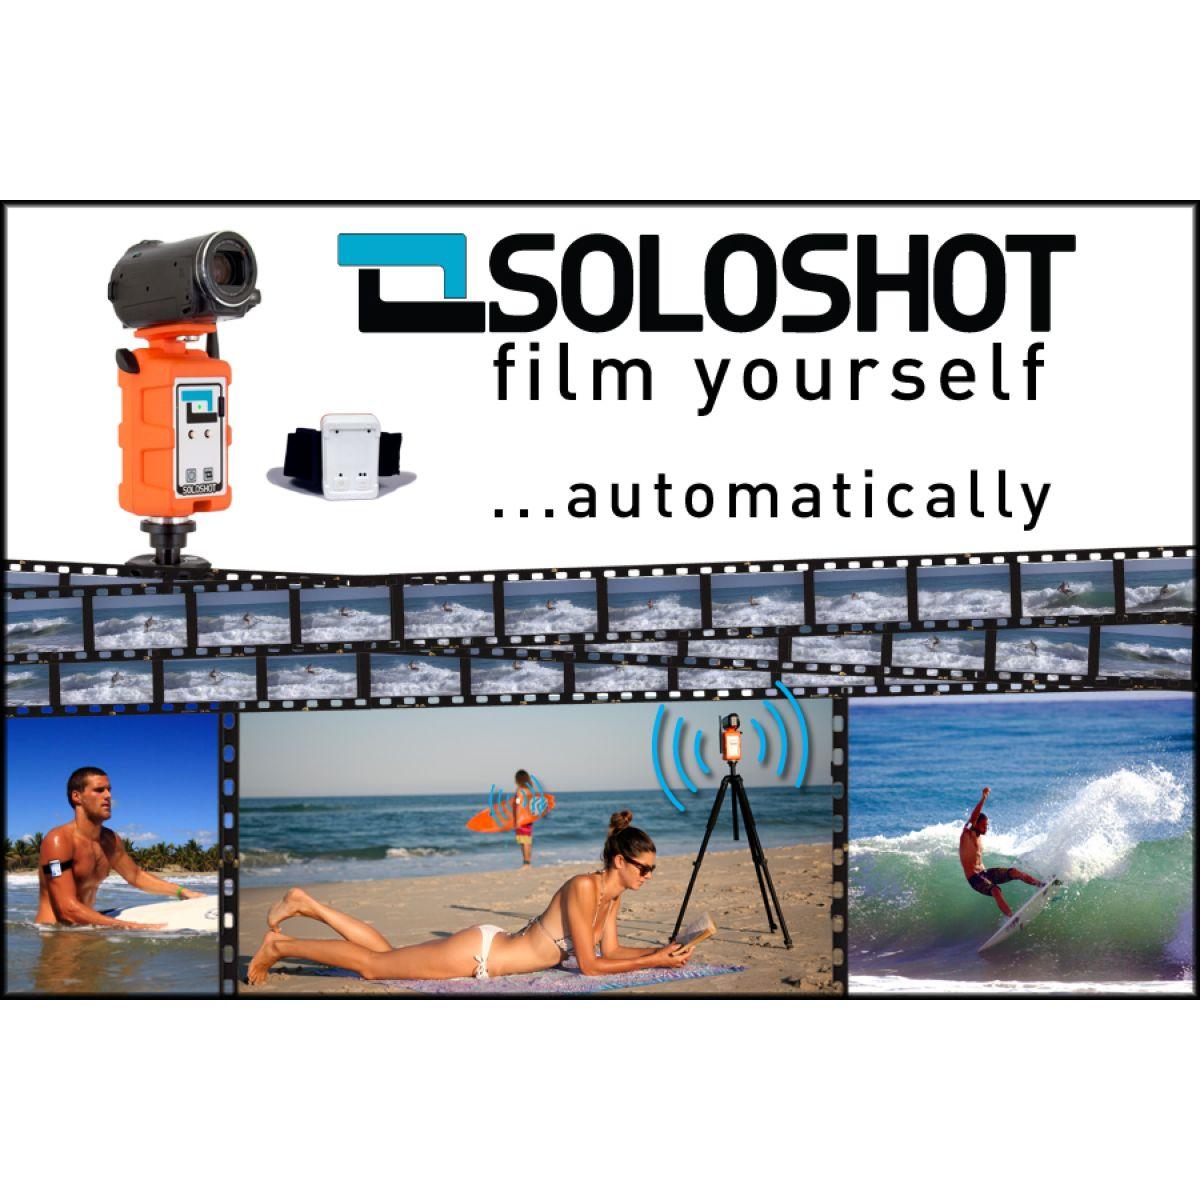 SOLOSHOT2: http://goo.gl/UX8W03, #SoloShot2 #Soloshot #filmyourself #robotcamera #robotcameraman #videopic.twitter.com/KCX3fhGRUq